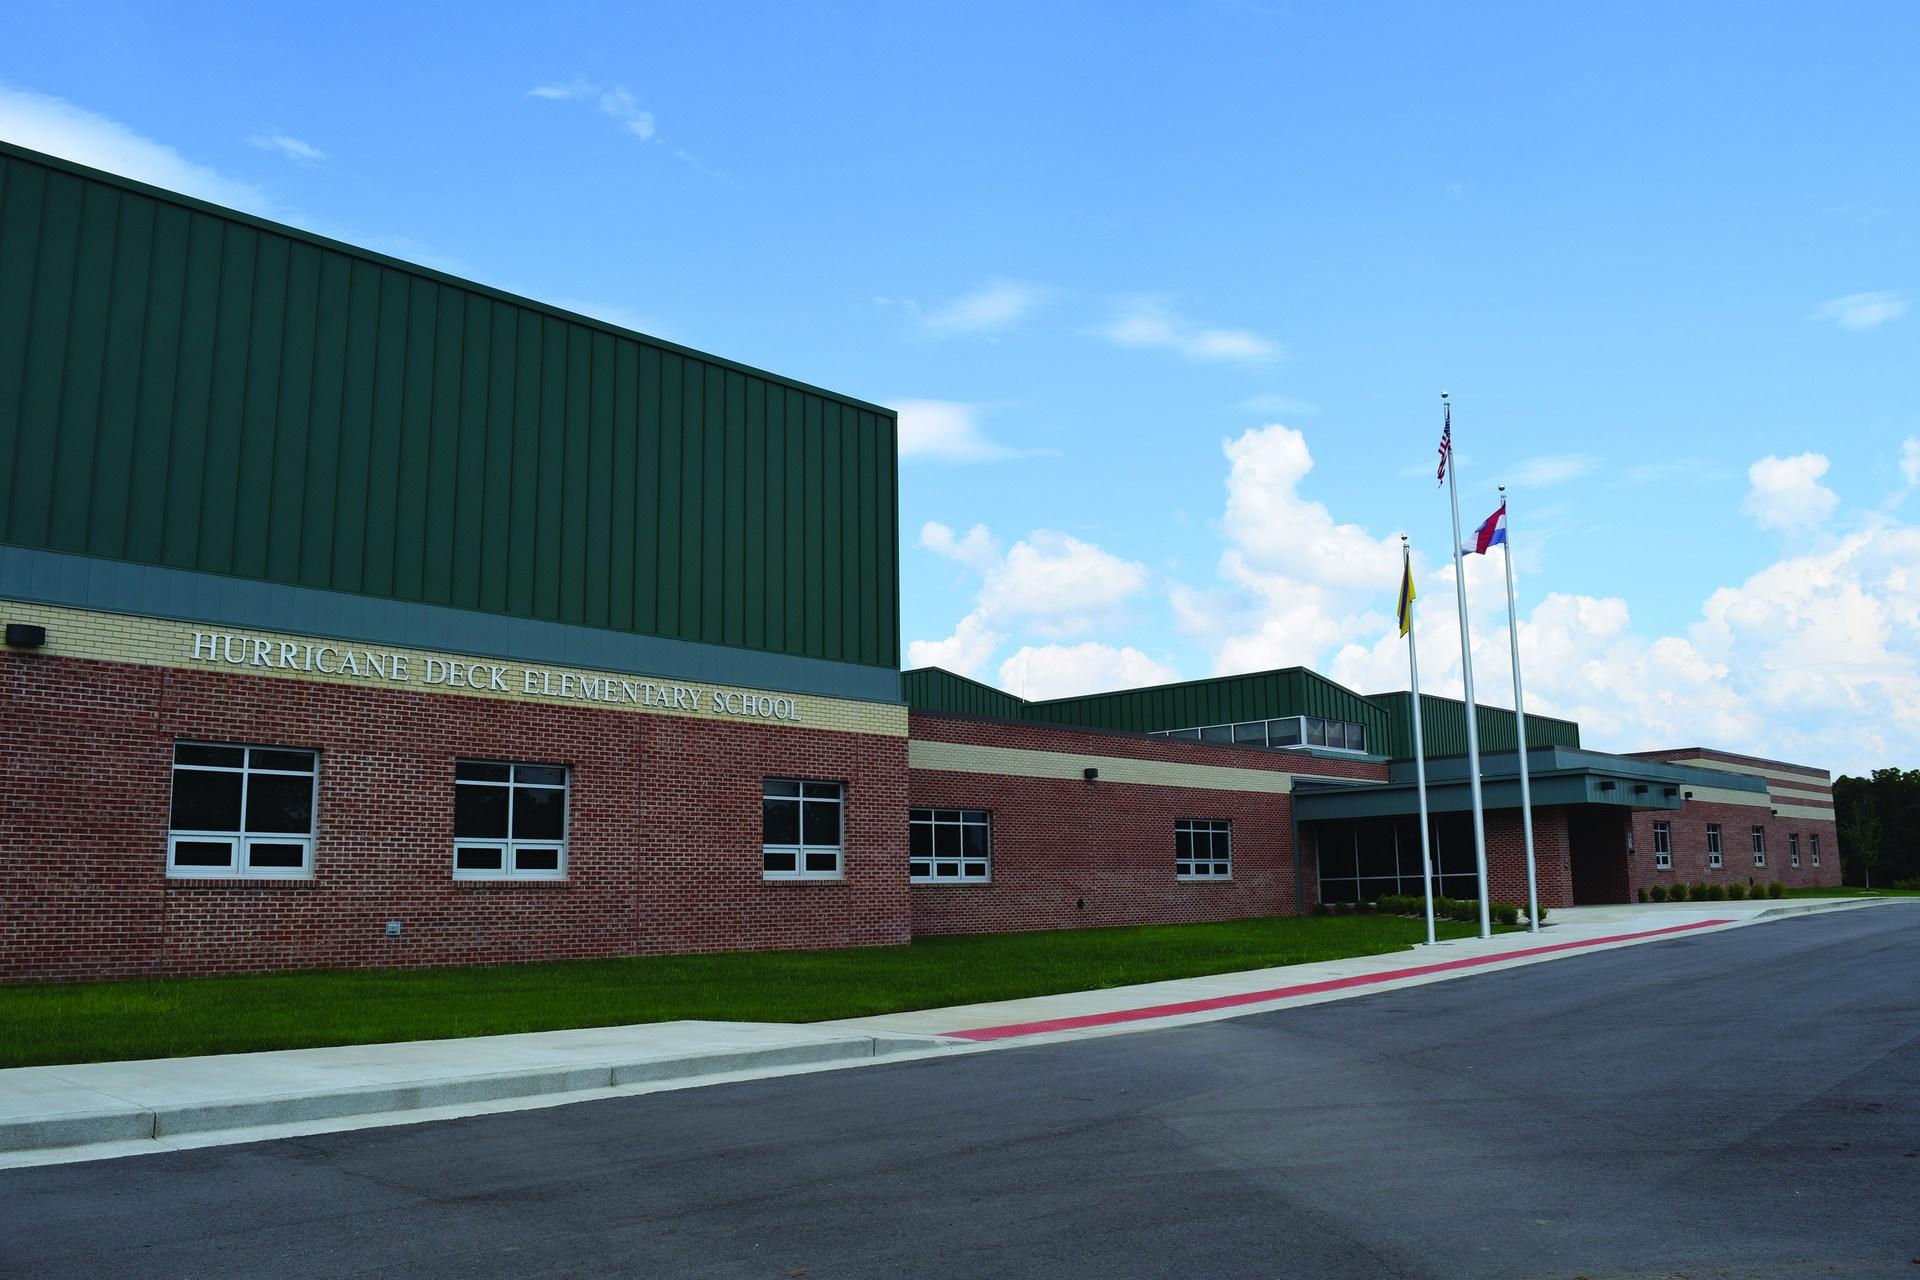 Hurricane Deck Elementary